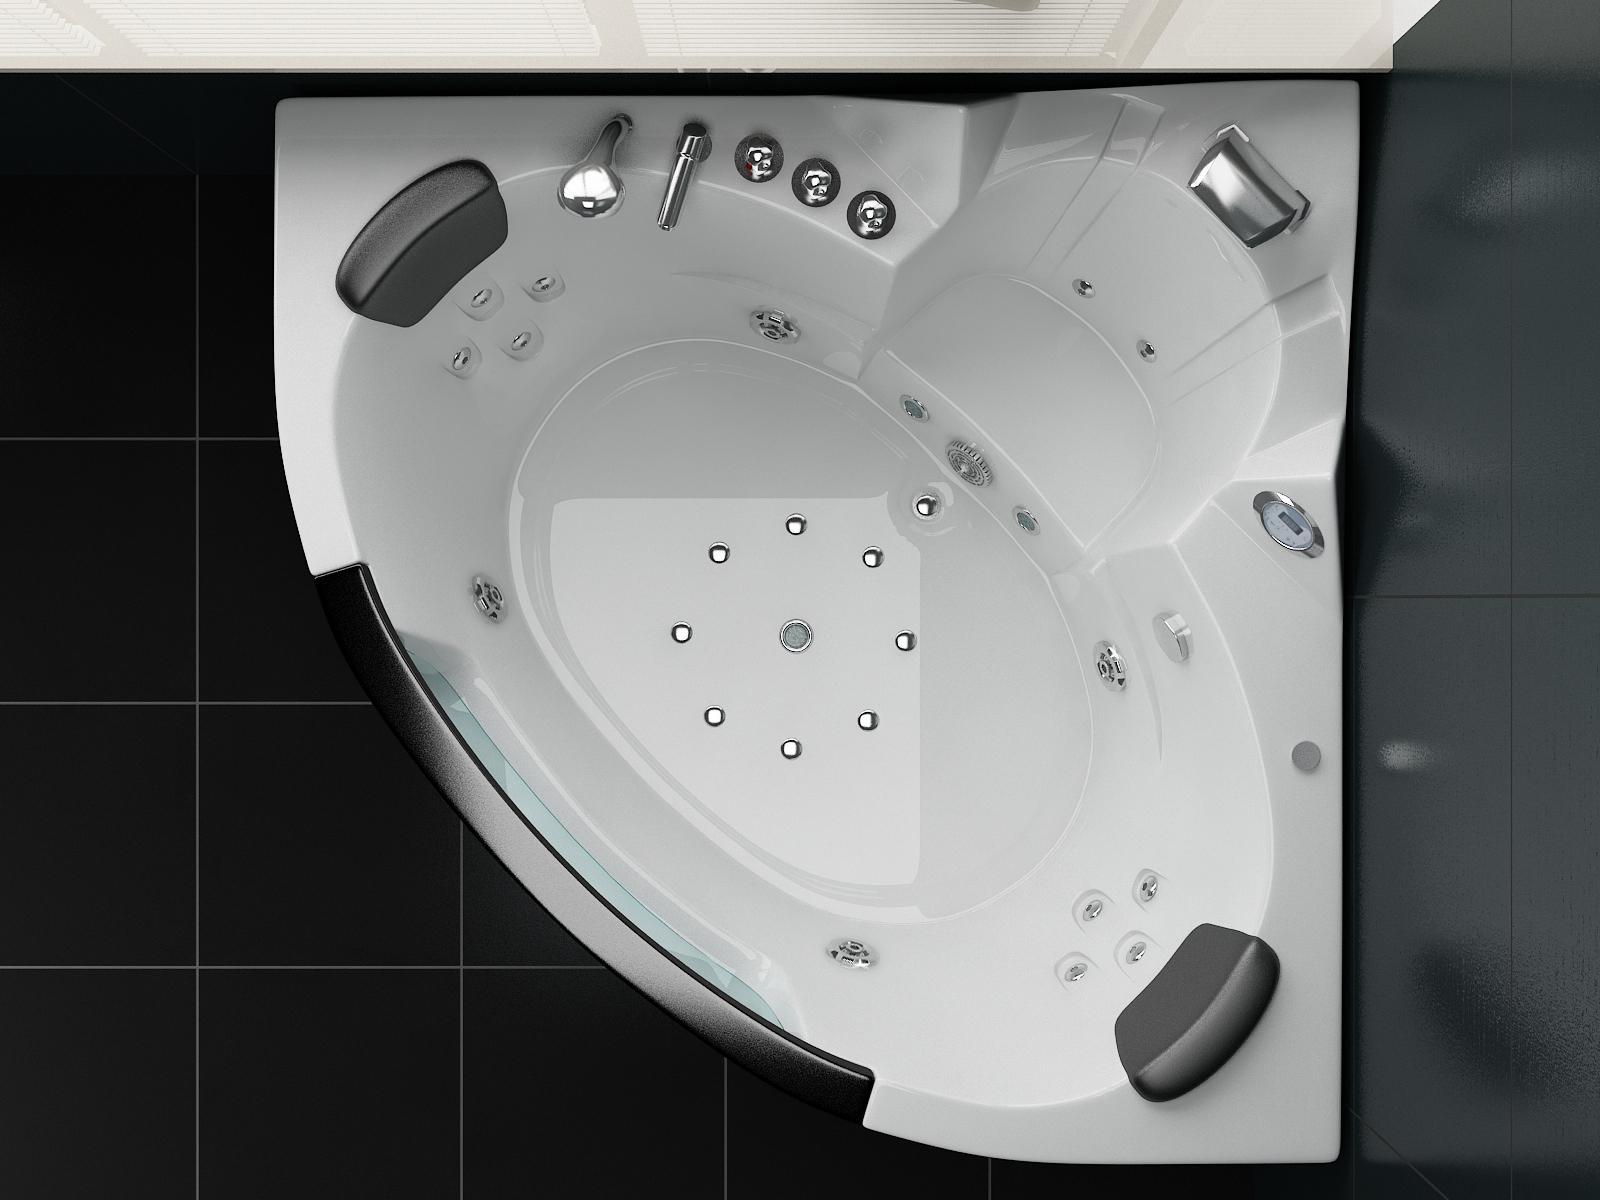 ouest balneo baignoire balneo ouest baln o baignoire. Black Bedroom Furniture Sets. Home Design Ideas